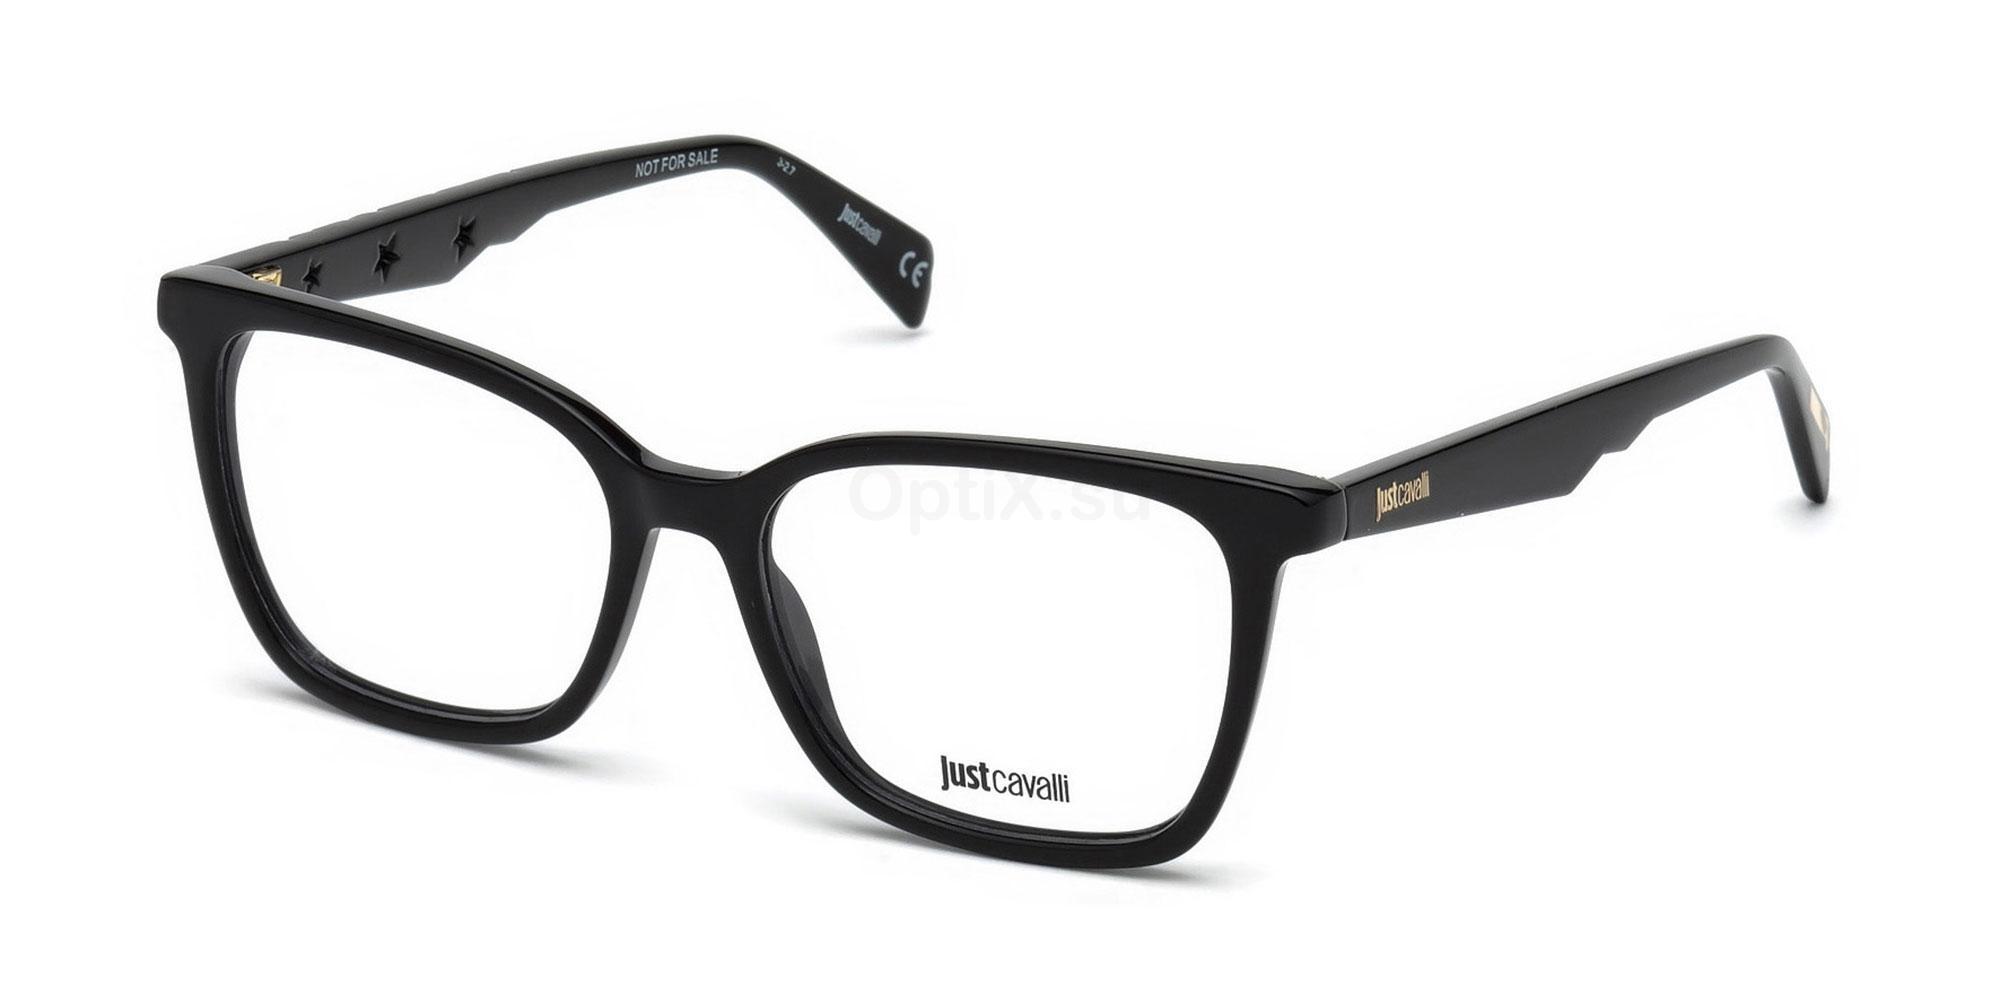 001 JC0844 Glasses, Just Cavalli